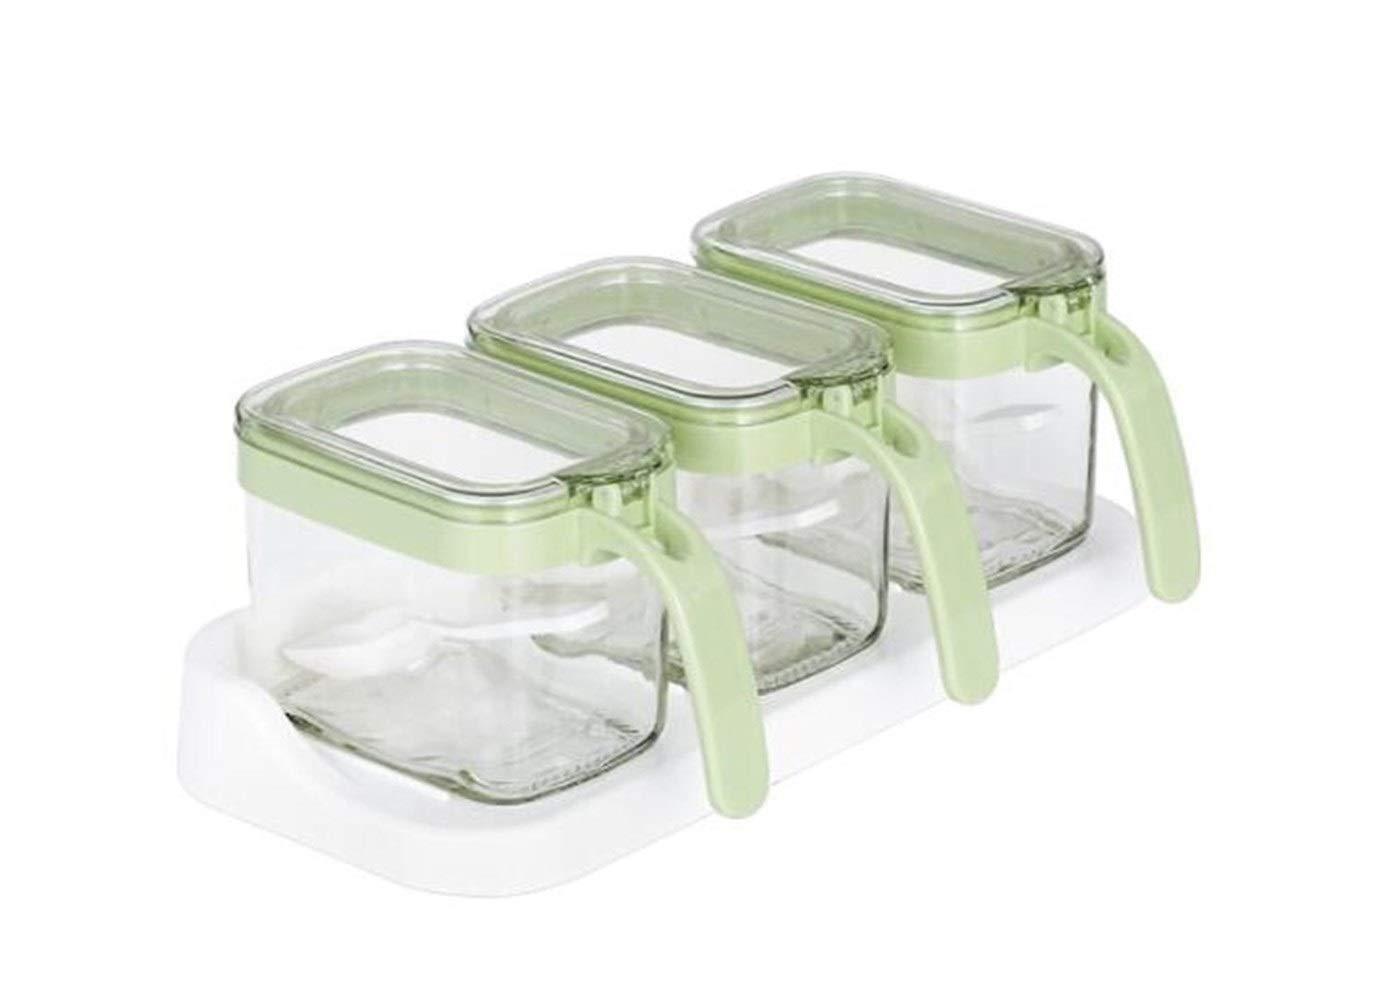 MINGRUIGONGMAO Seasoning box, multi-function kitchen salt and sugar flavored storage box, home with lid creative seasoning box, green spoon spoon box Plush toys (Color : Green) by MINGRUIGONGMAO